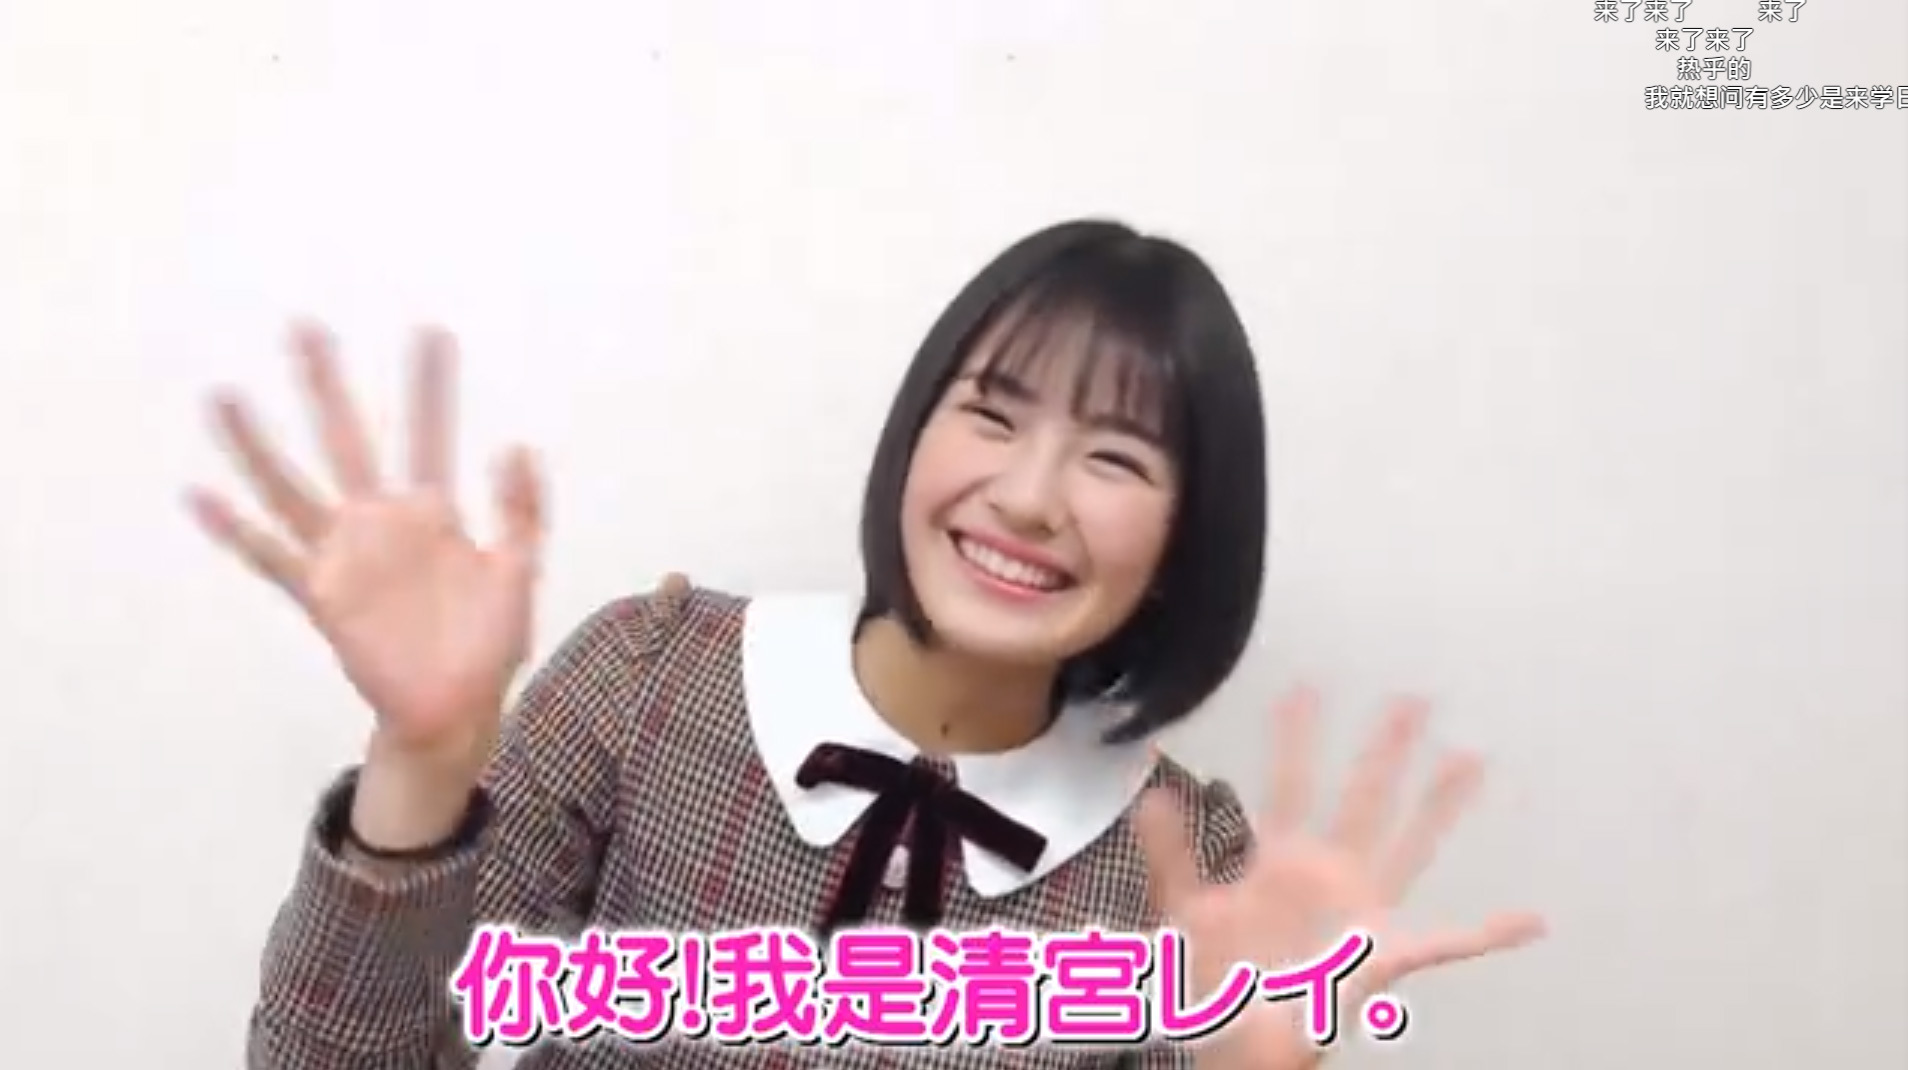 bilibili 乃木坂46日本語教室~握手会清宮レイ編~